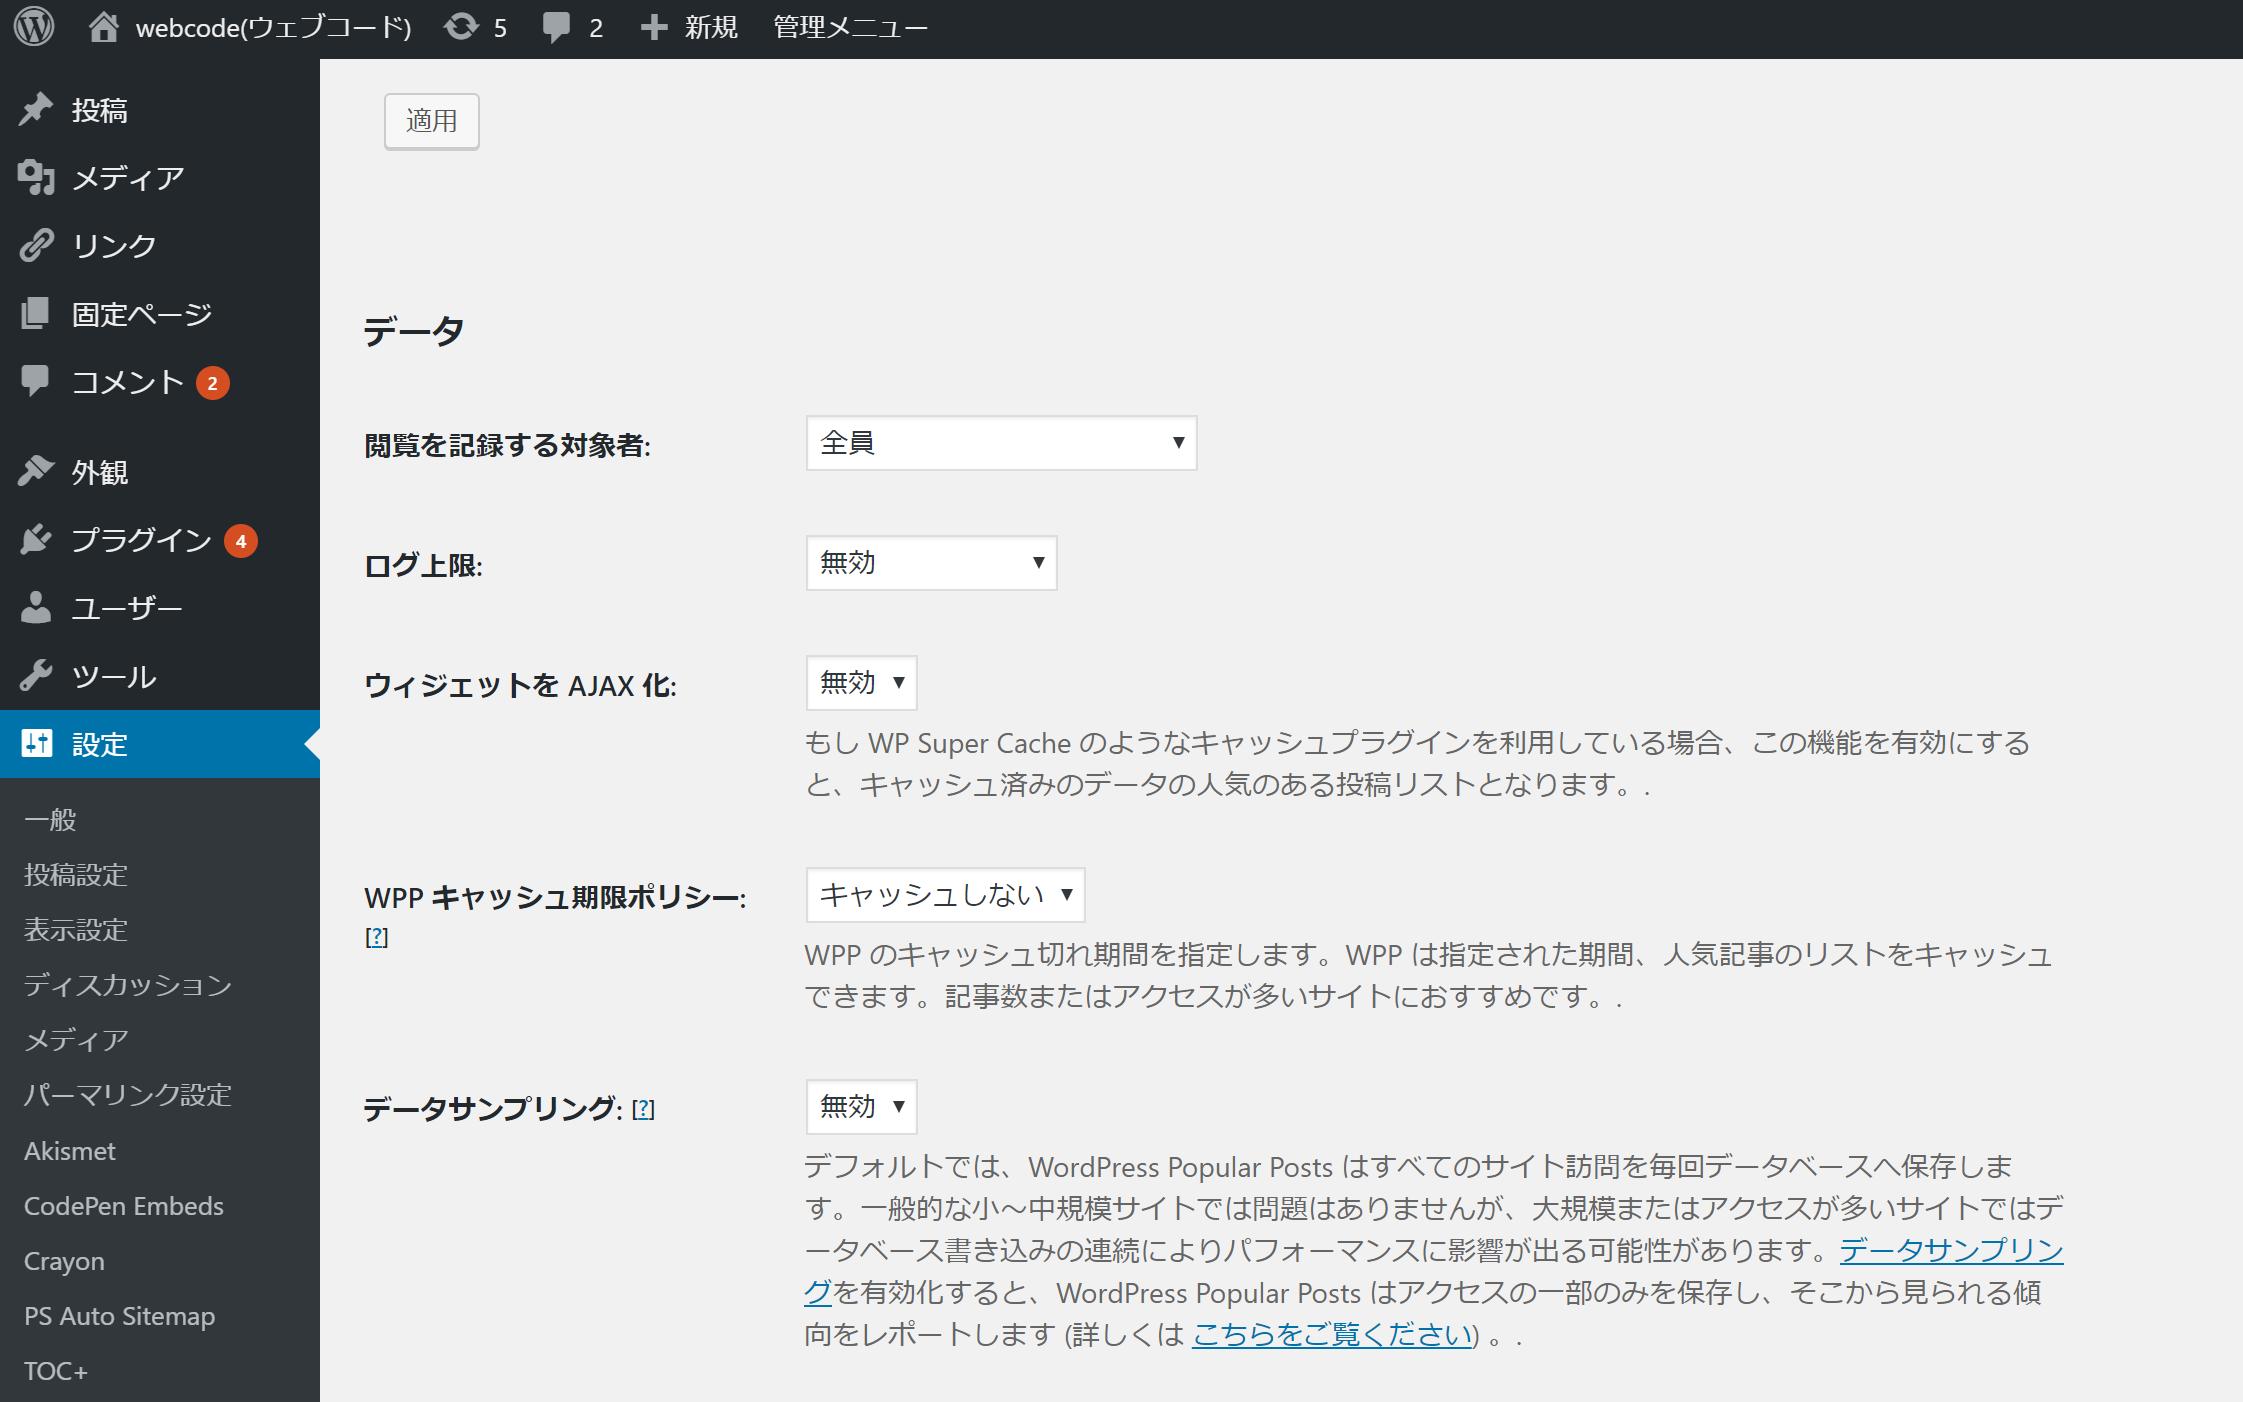 wpp data - WordPress Popular Postsの設定やカスタマイズの方法まとめ!人気記事をランキング形式で表示